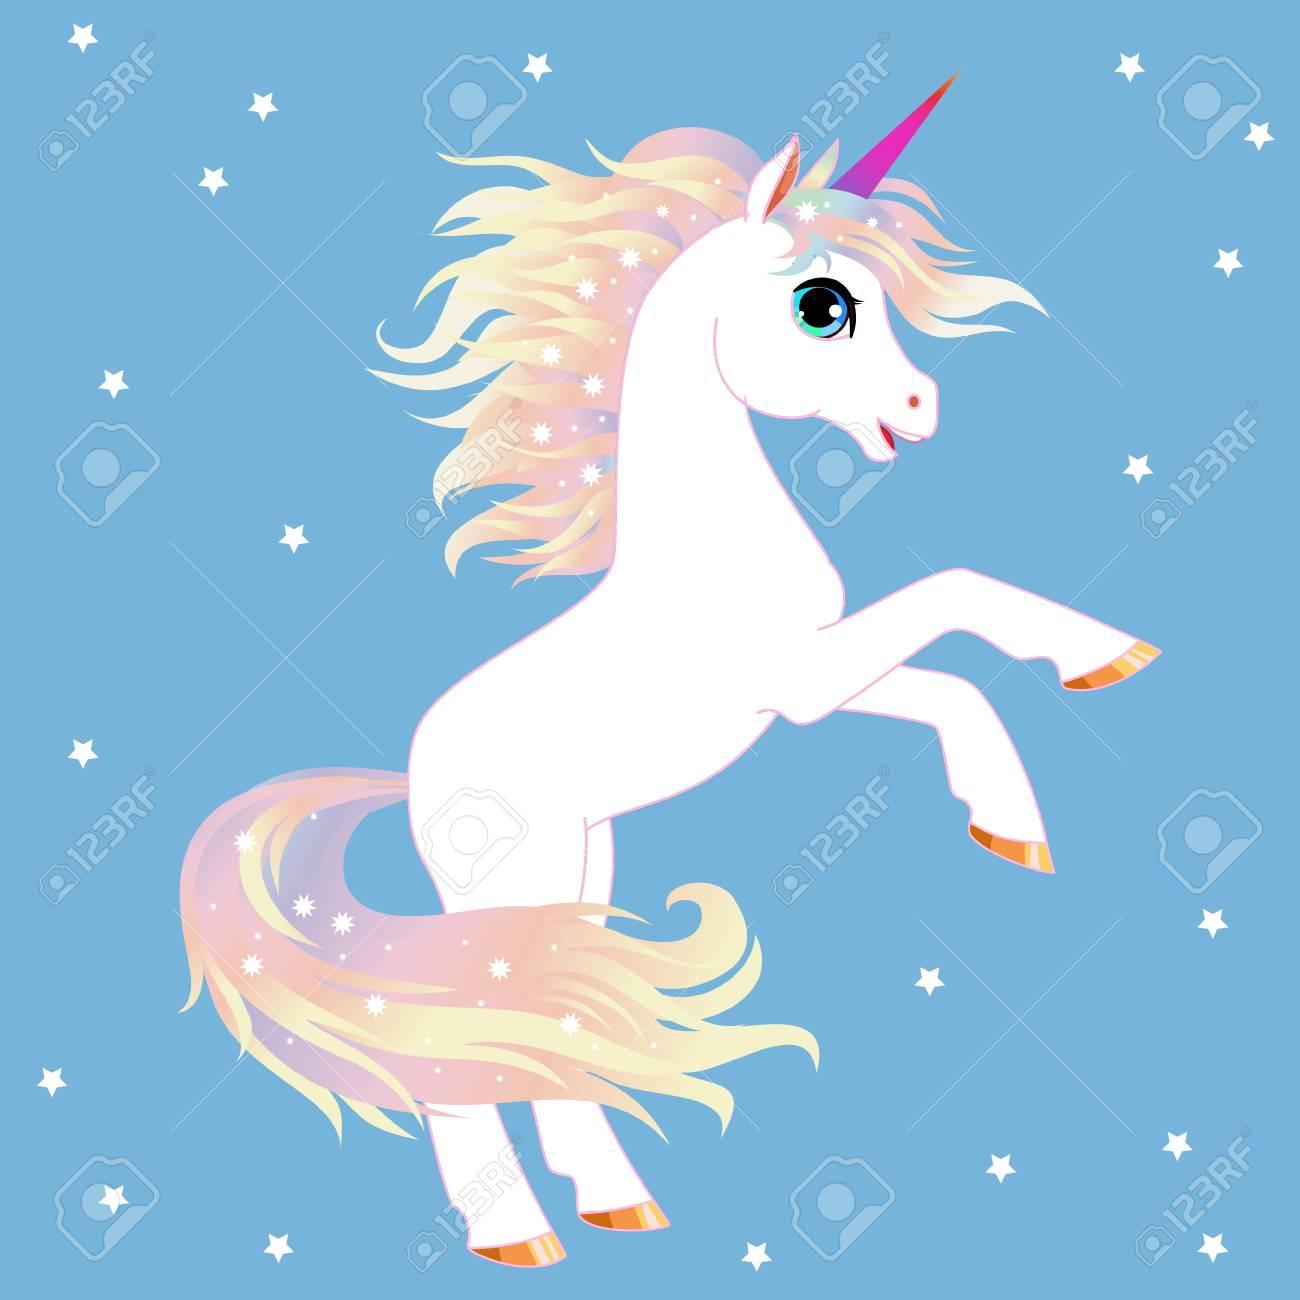 Unicorn Vector Illustration Magic Fantasy Horse Design For Royalty Free Cliparts Vectors And Stock Illustration Image 93517578